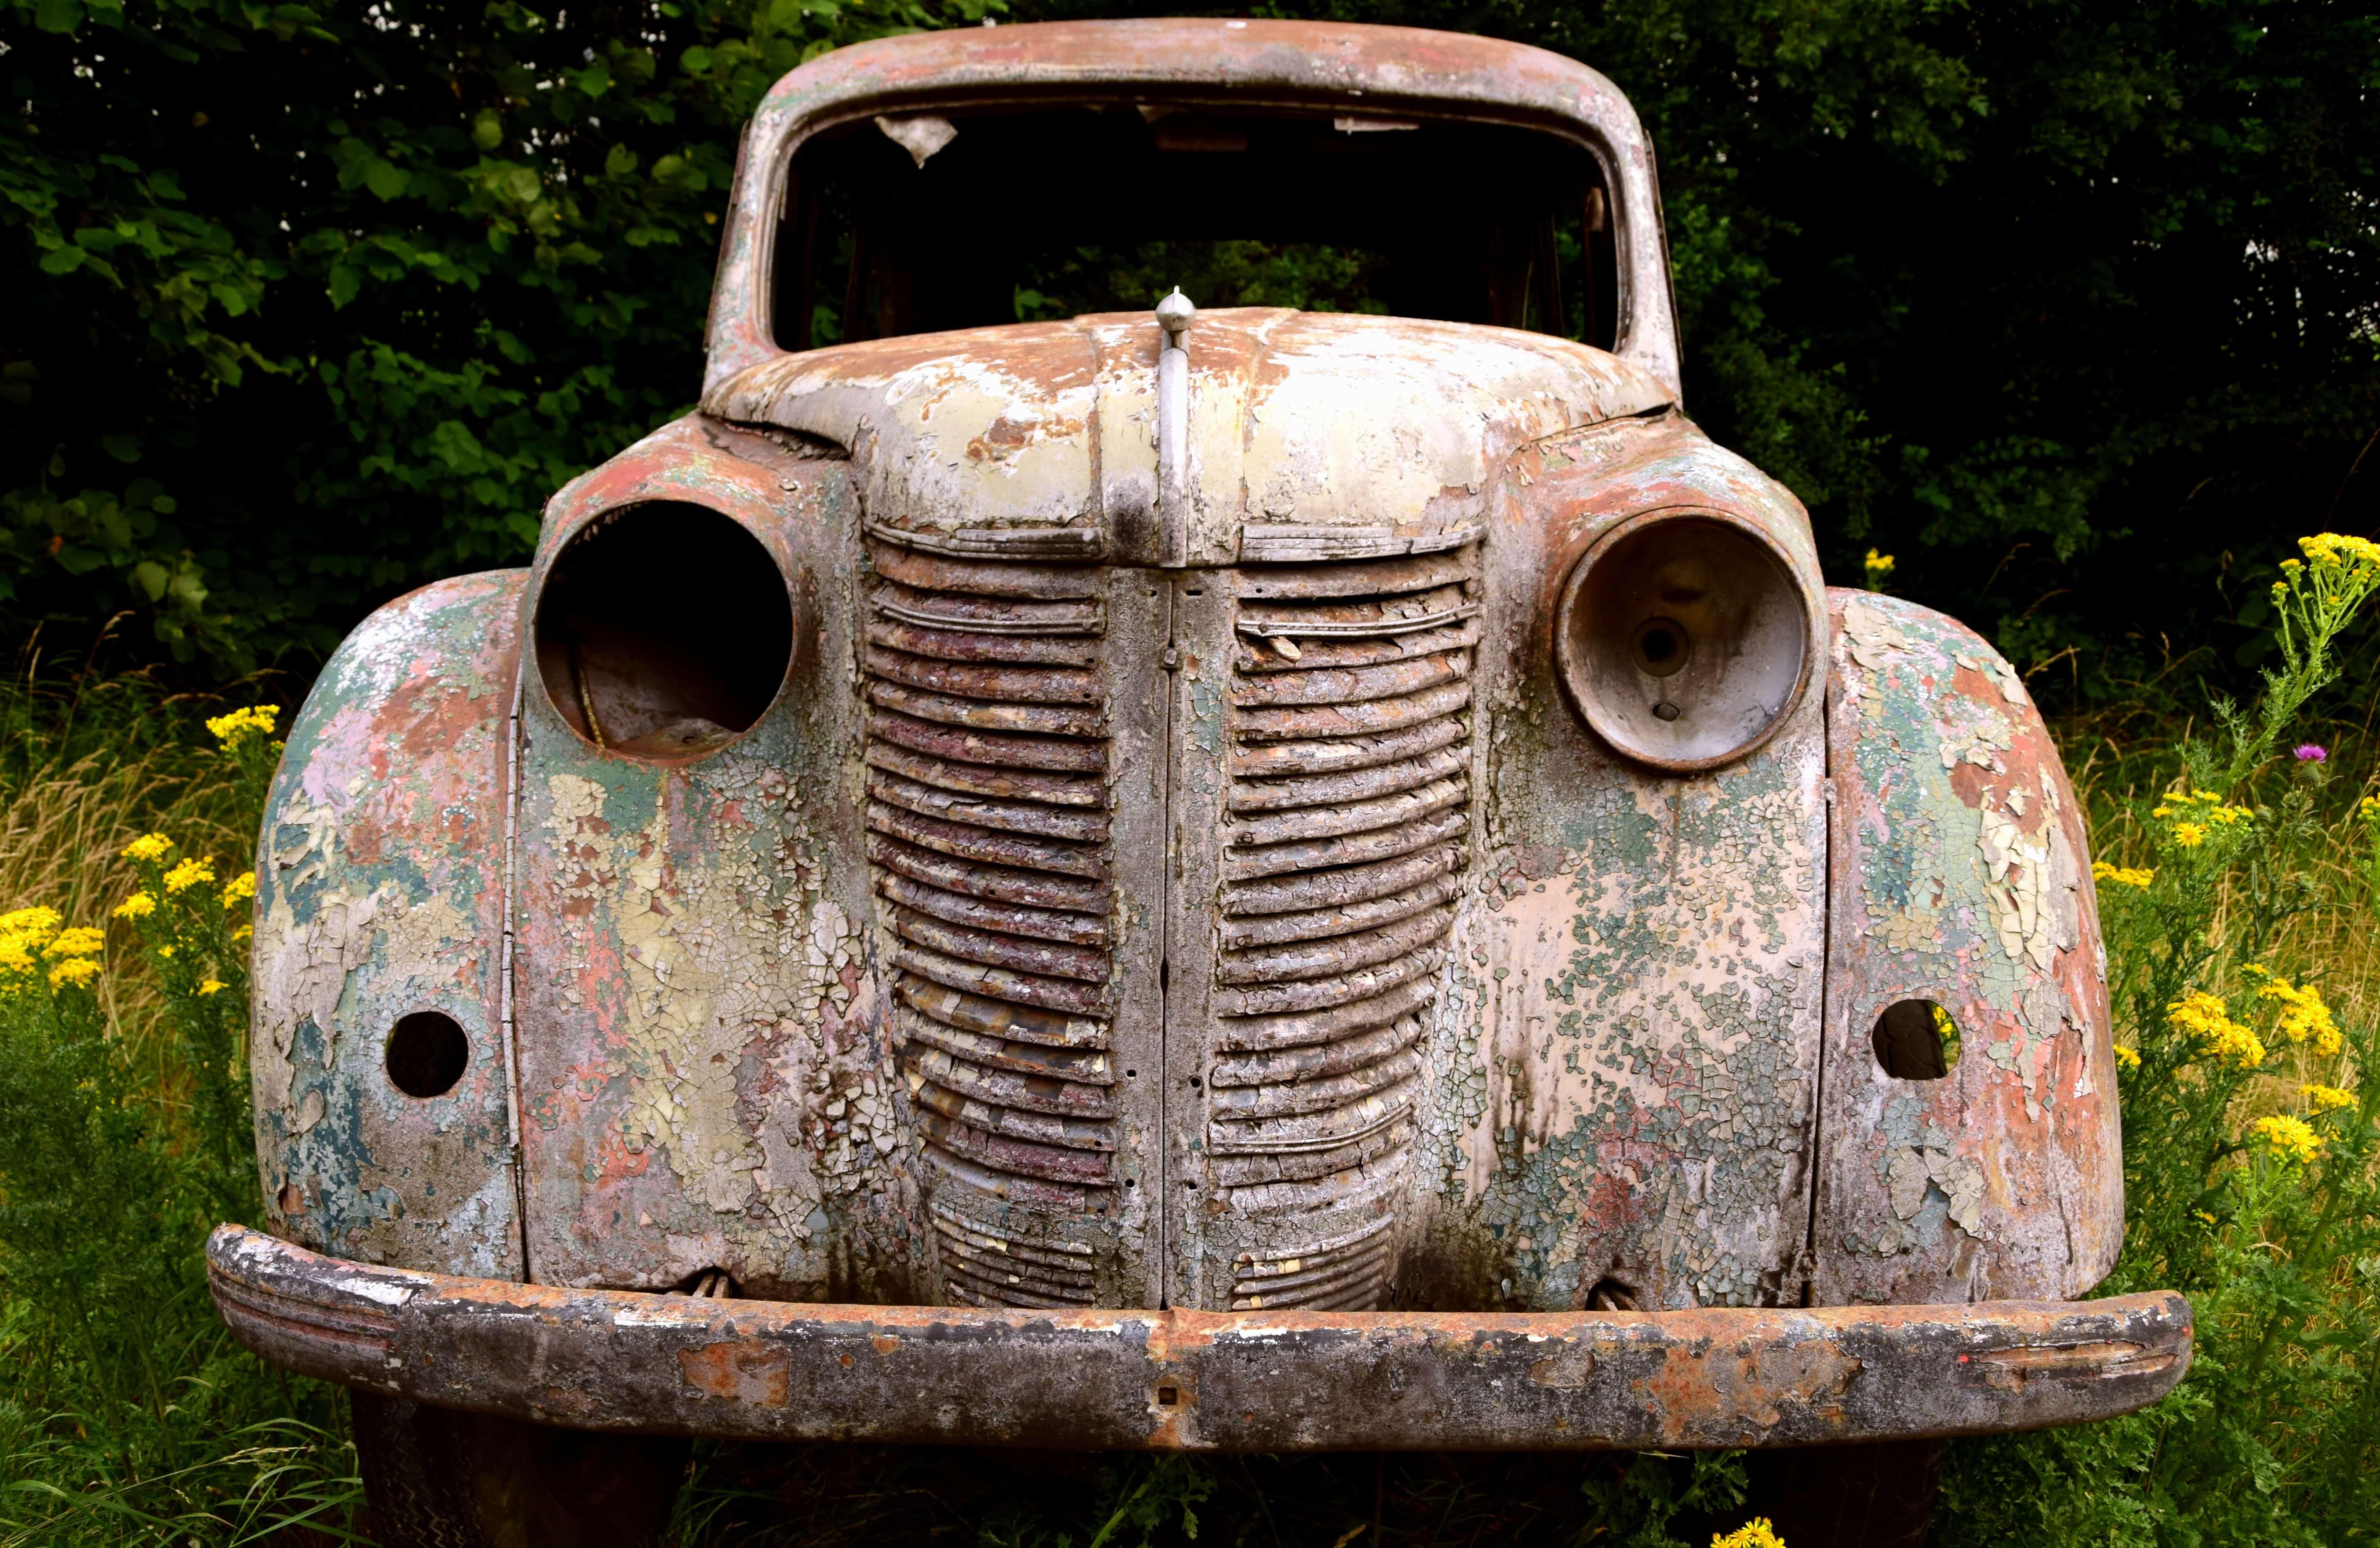 Free picture: classic, vehicle, retro, antique, old, car, automobile